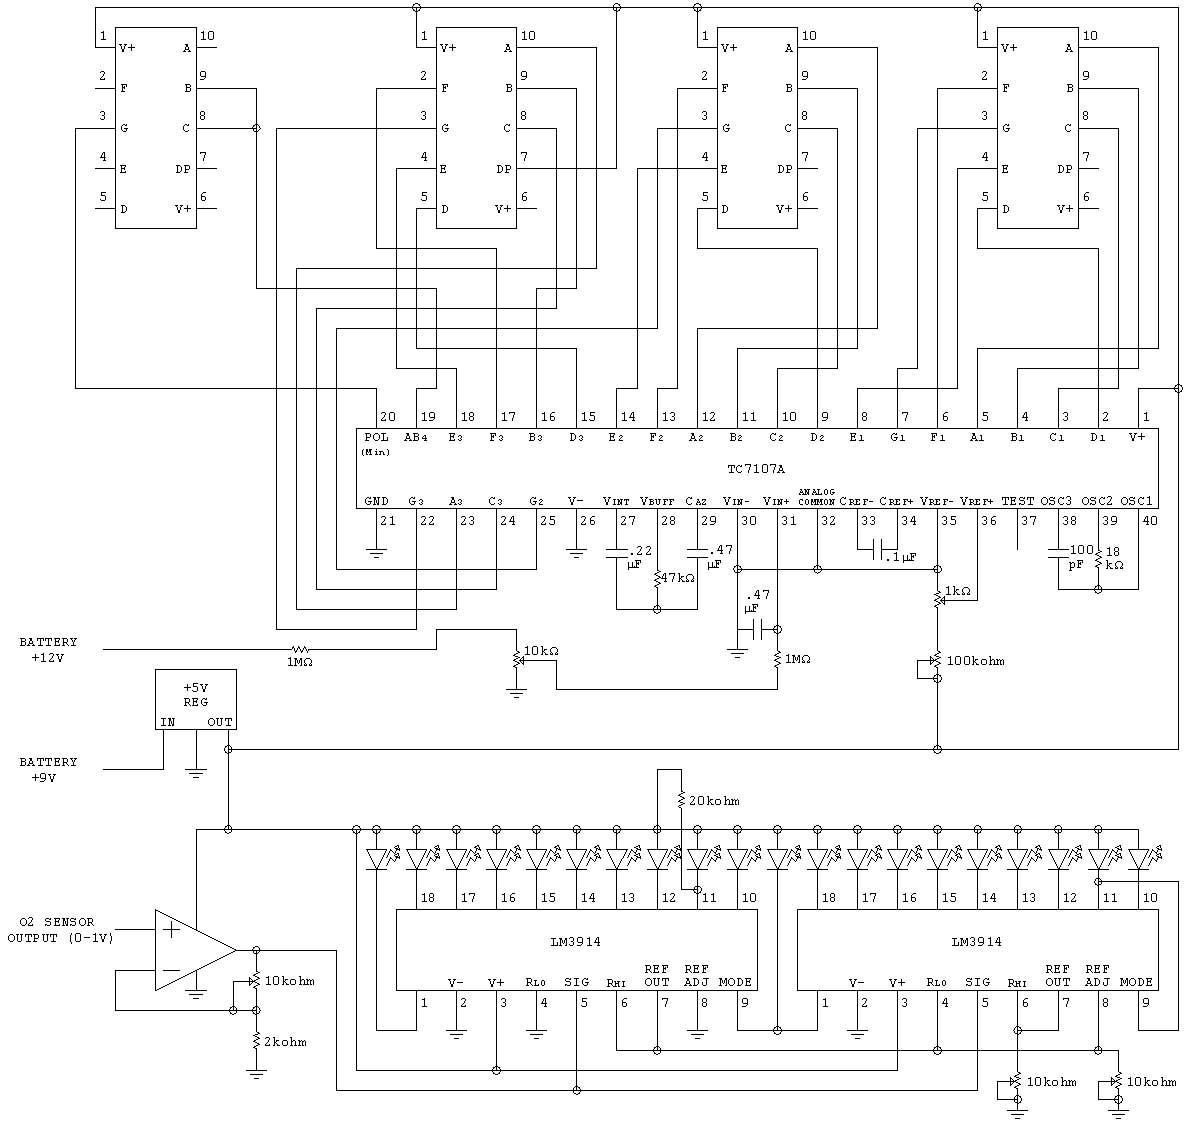 Perodua Viva Wiring Diagram - Rasmi Suf on